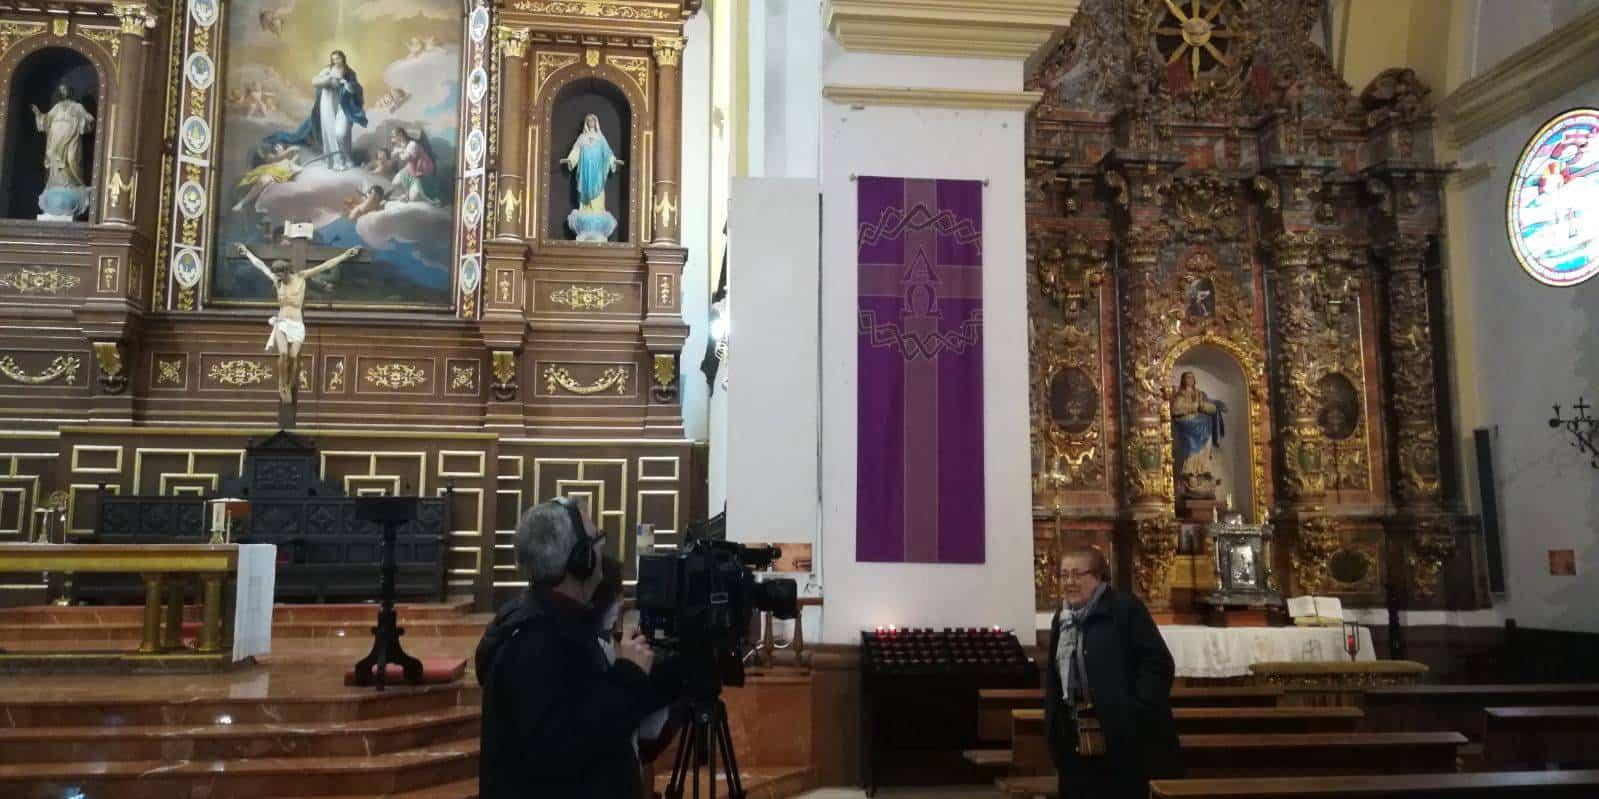 Mancha Centro Television en la parroquia de Herencia  - Mancha Centro Televisión emite un especial sobre la parroquia de Herencia